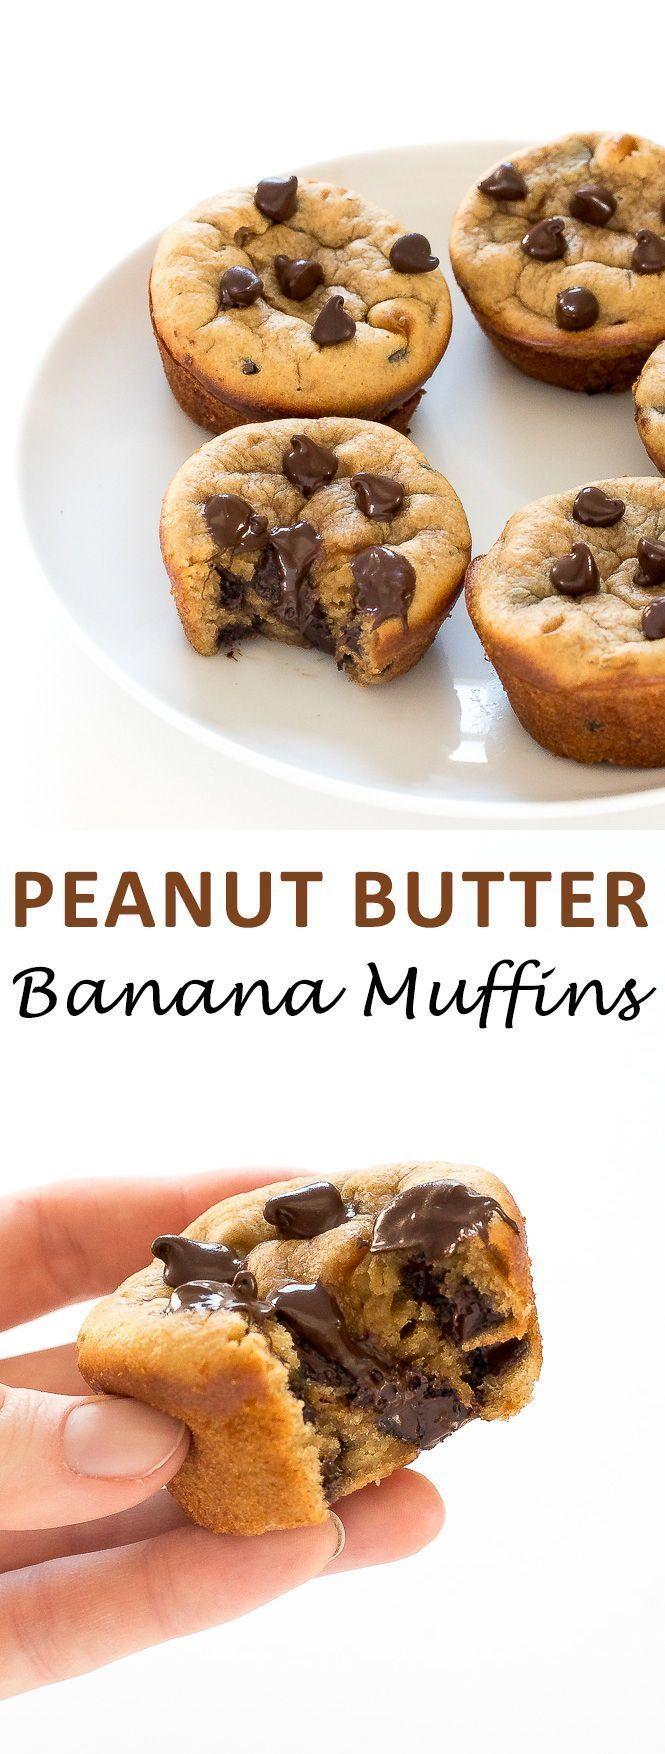 Flourless Peanut Butter Banana Muffins - Chef Savvy